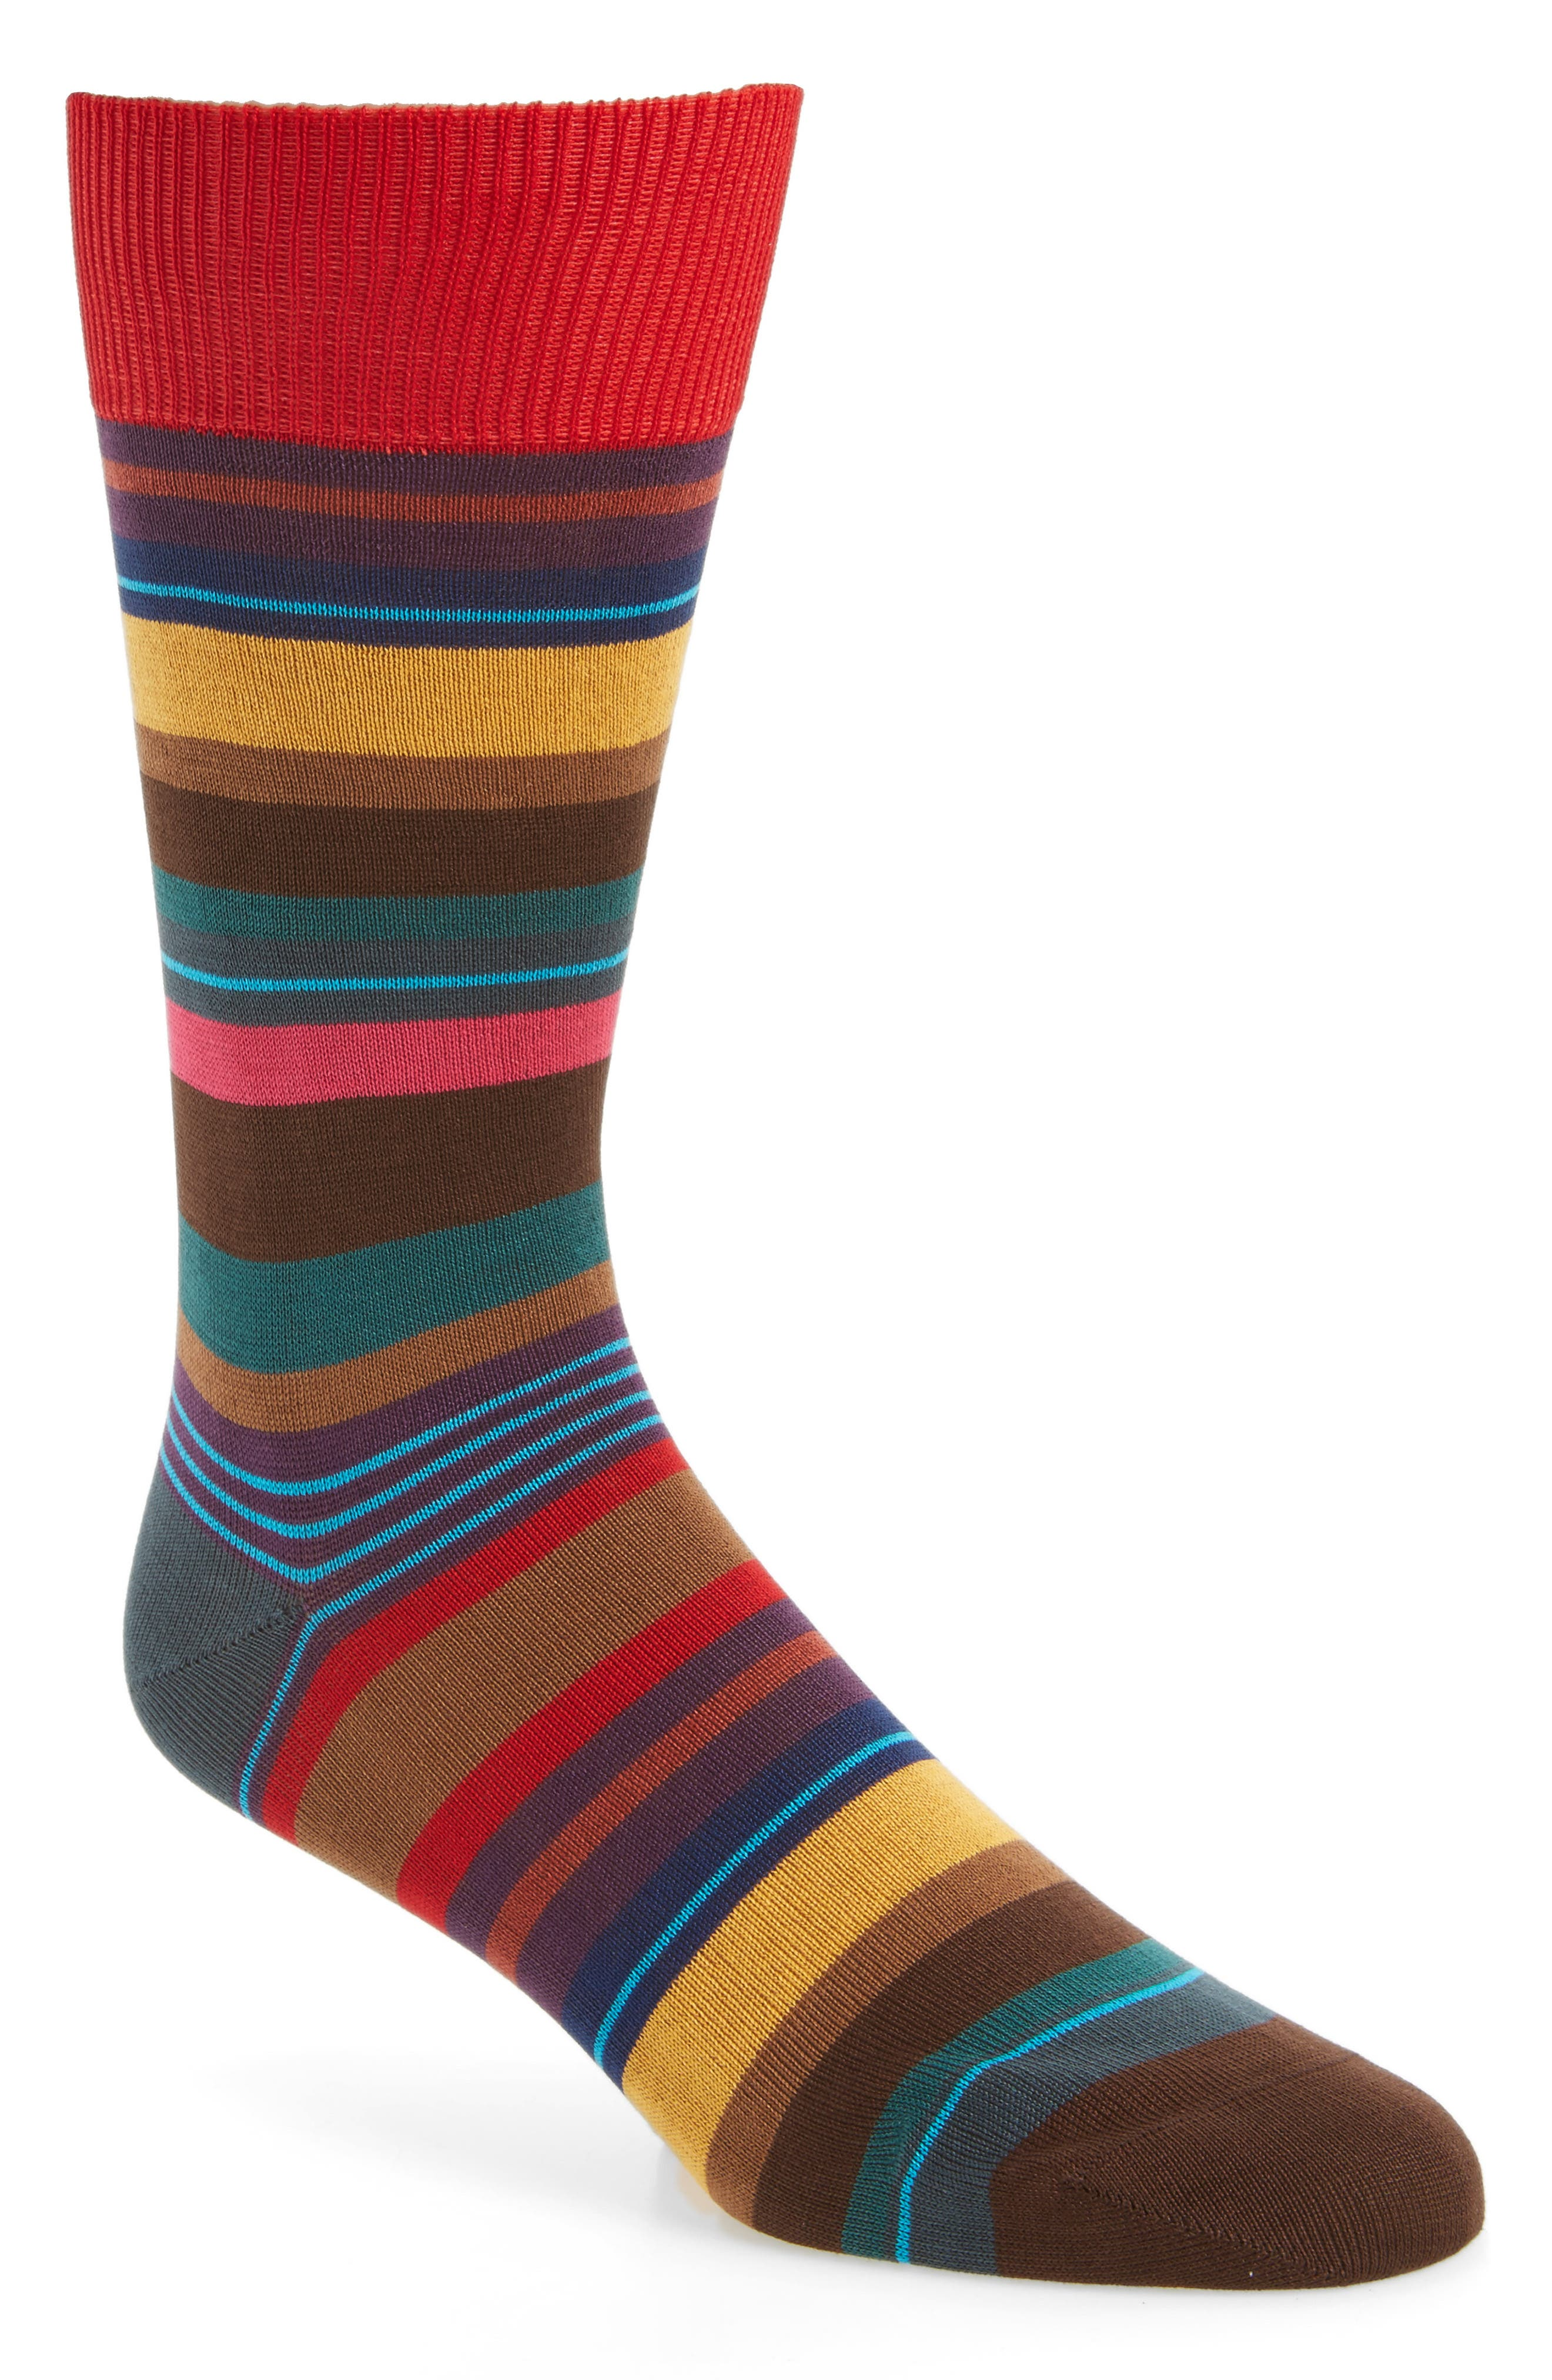 Halentoe Stripe Socks,                         Main,                         color, Red